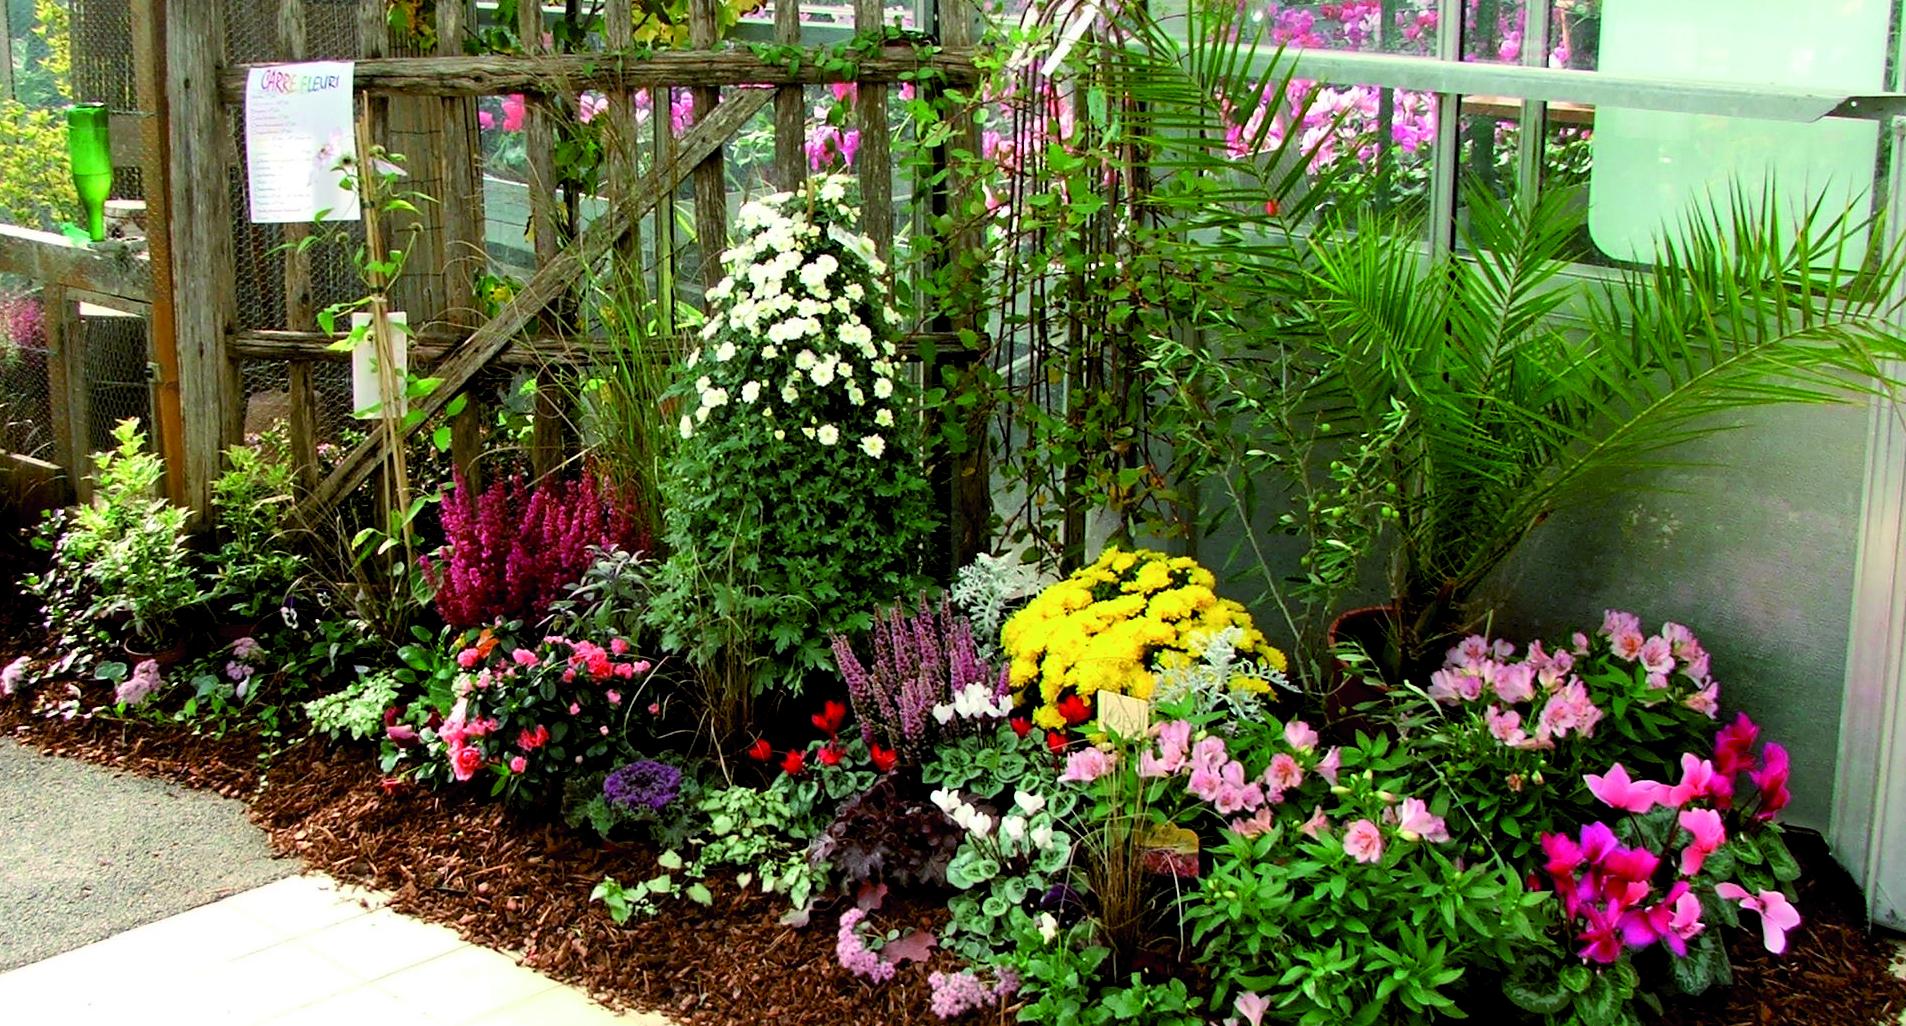 Best image jardin d ornement images amazing house design for Jardin ornement fleurs